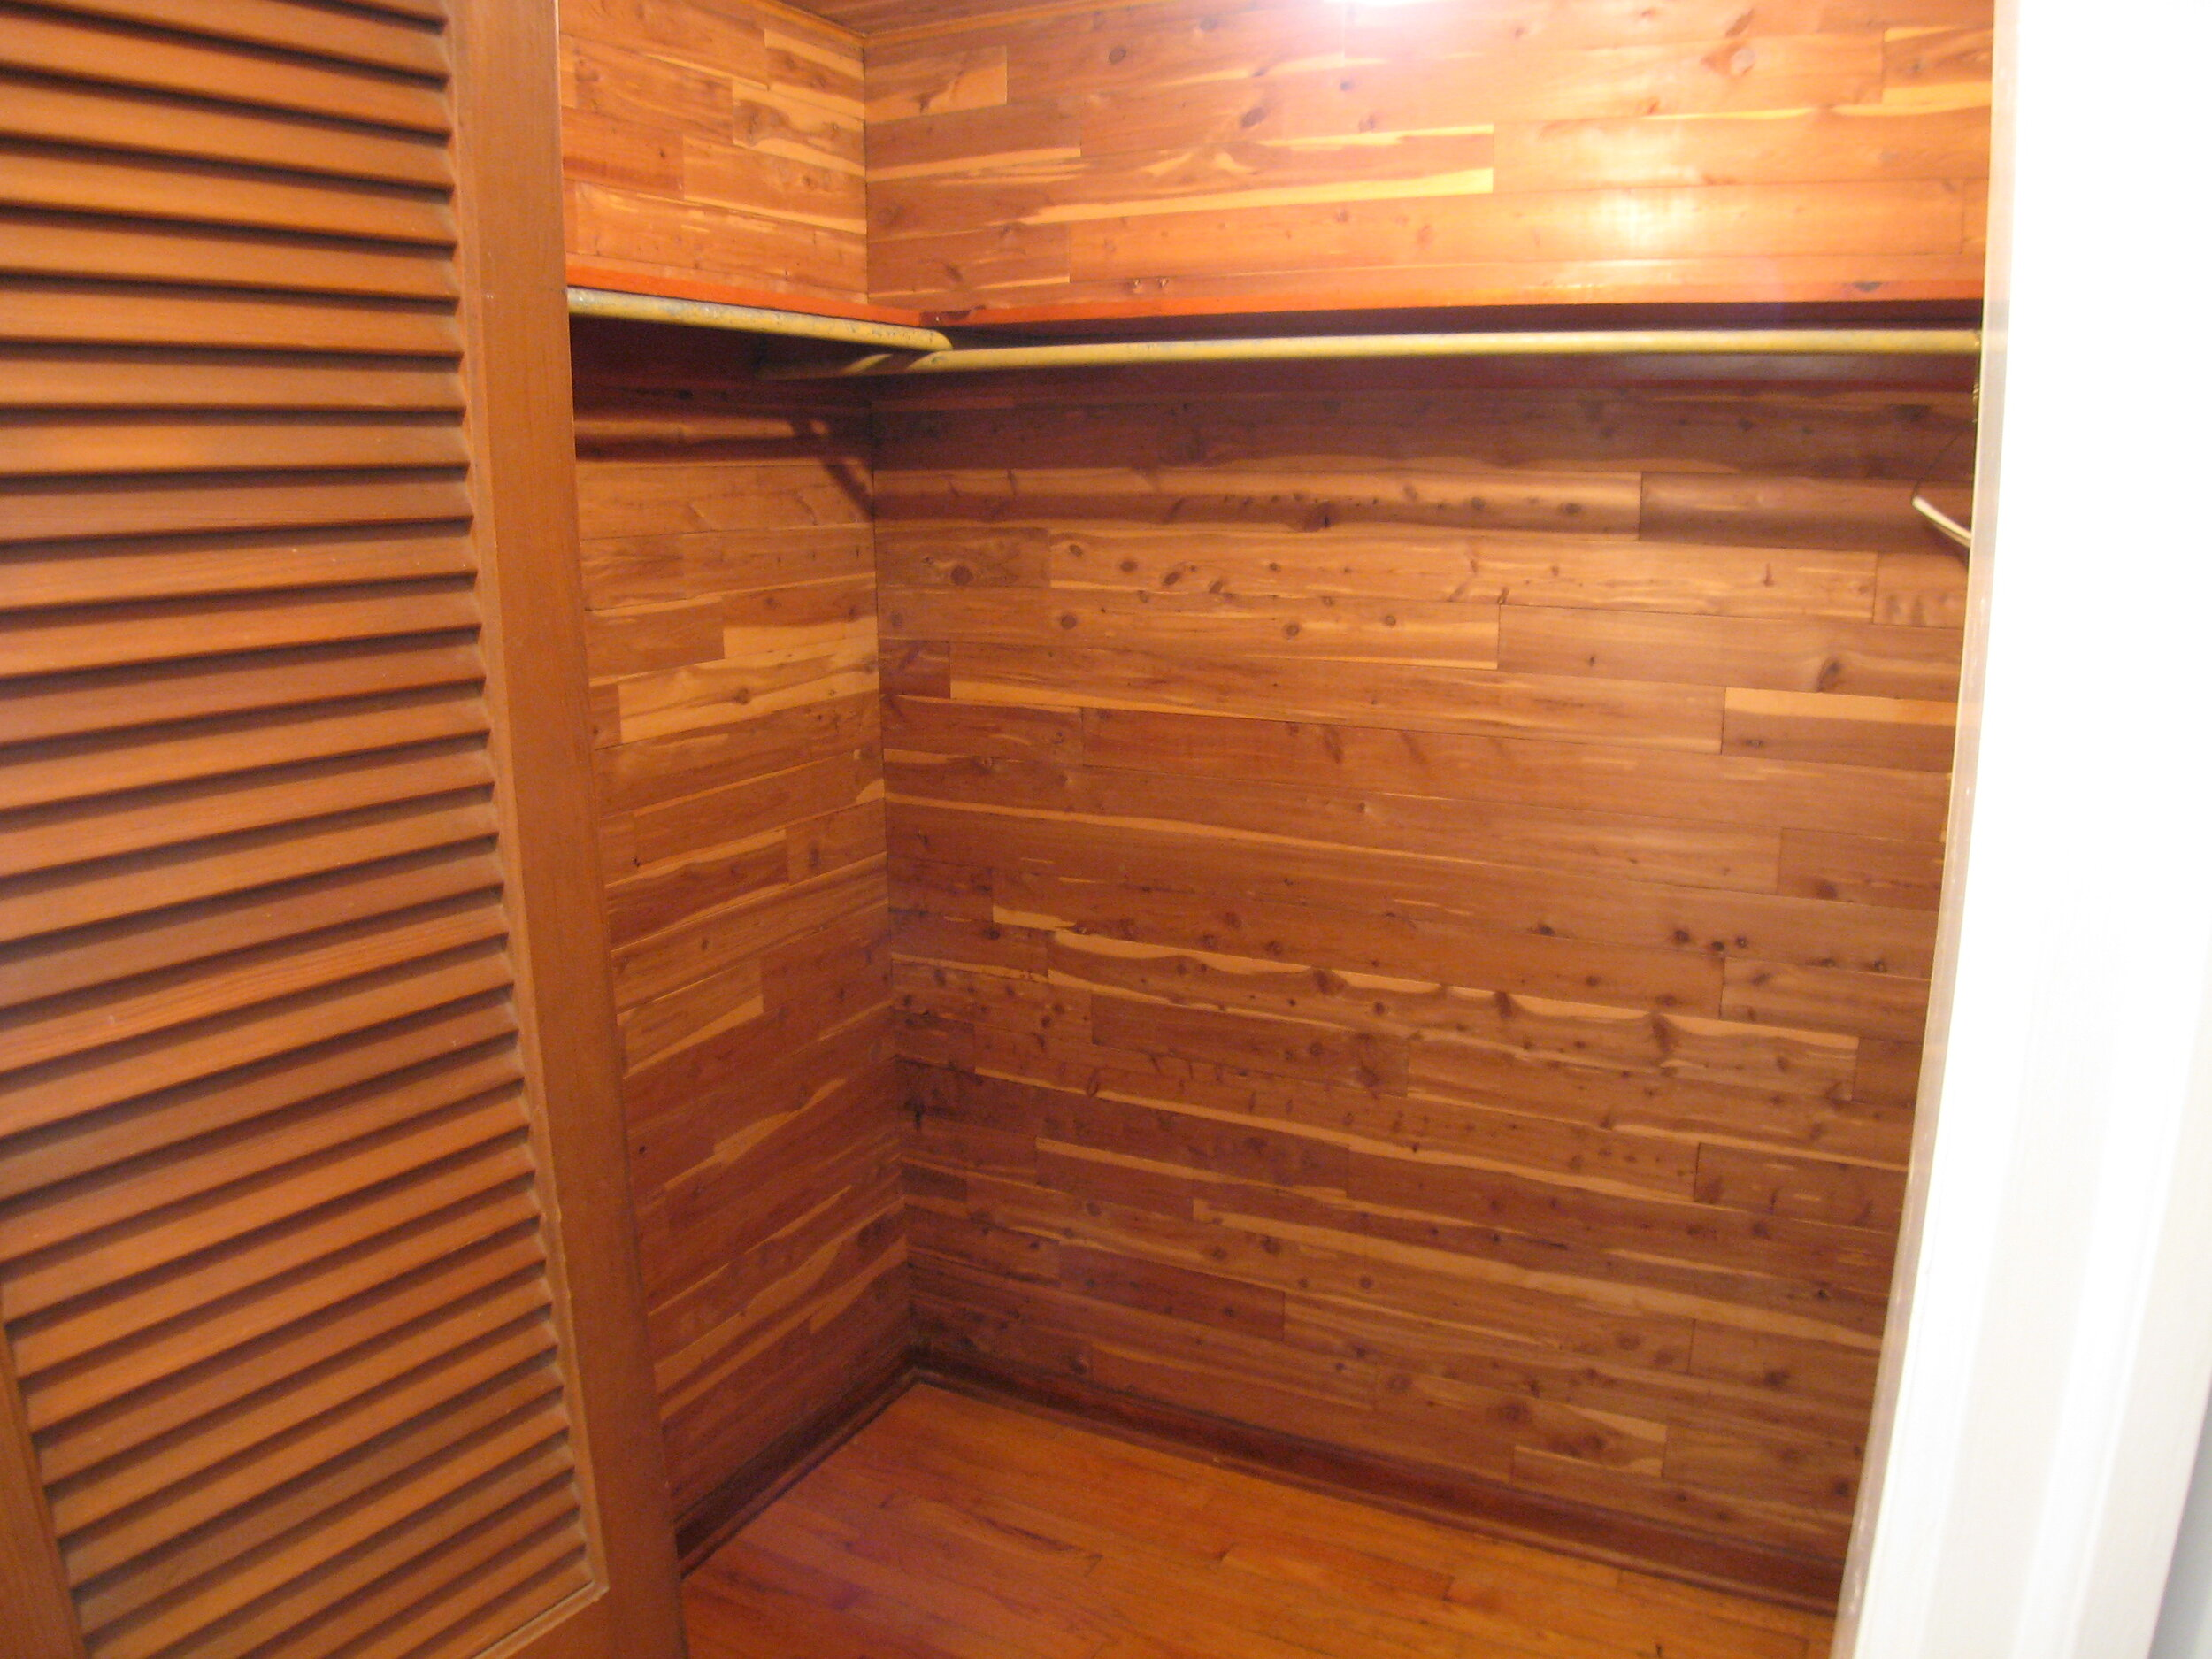 Upstairs Walk-in Cedar Closet